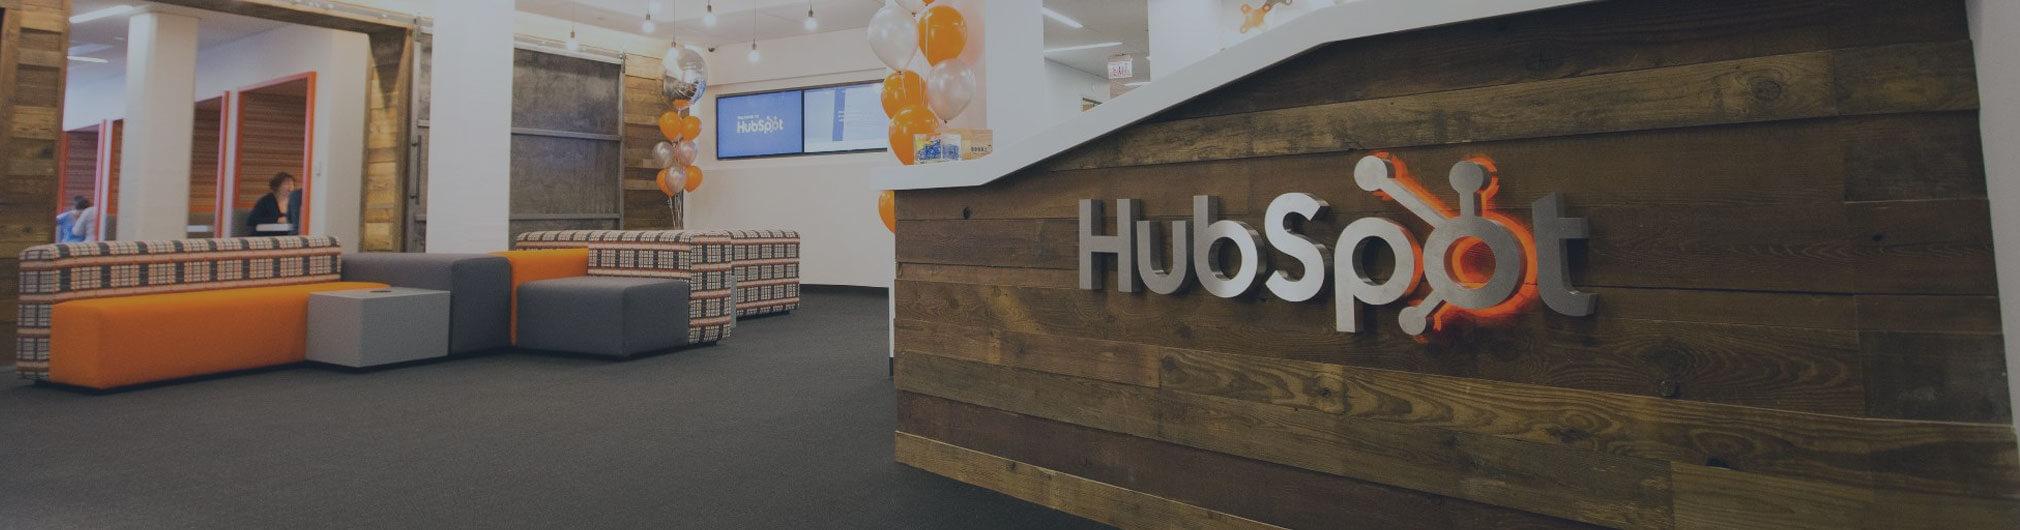 Entrevista a Martha Madero: ¿Qué significa ser parte del consejo de HubSpot?